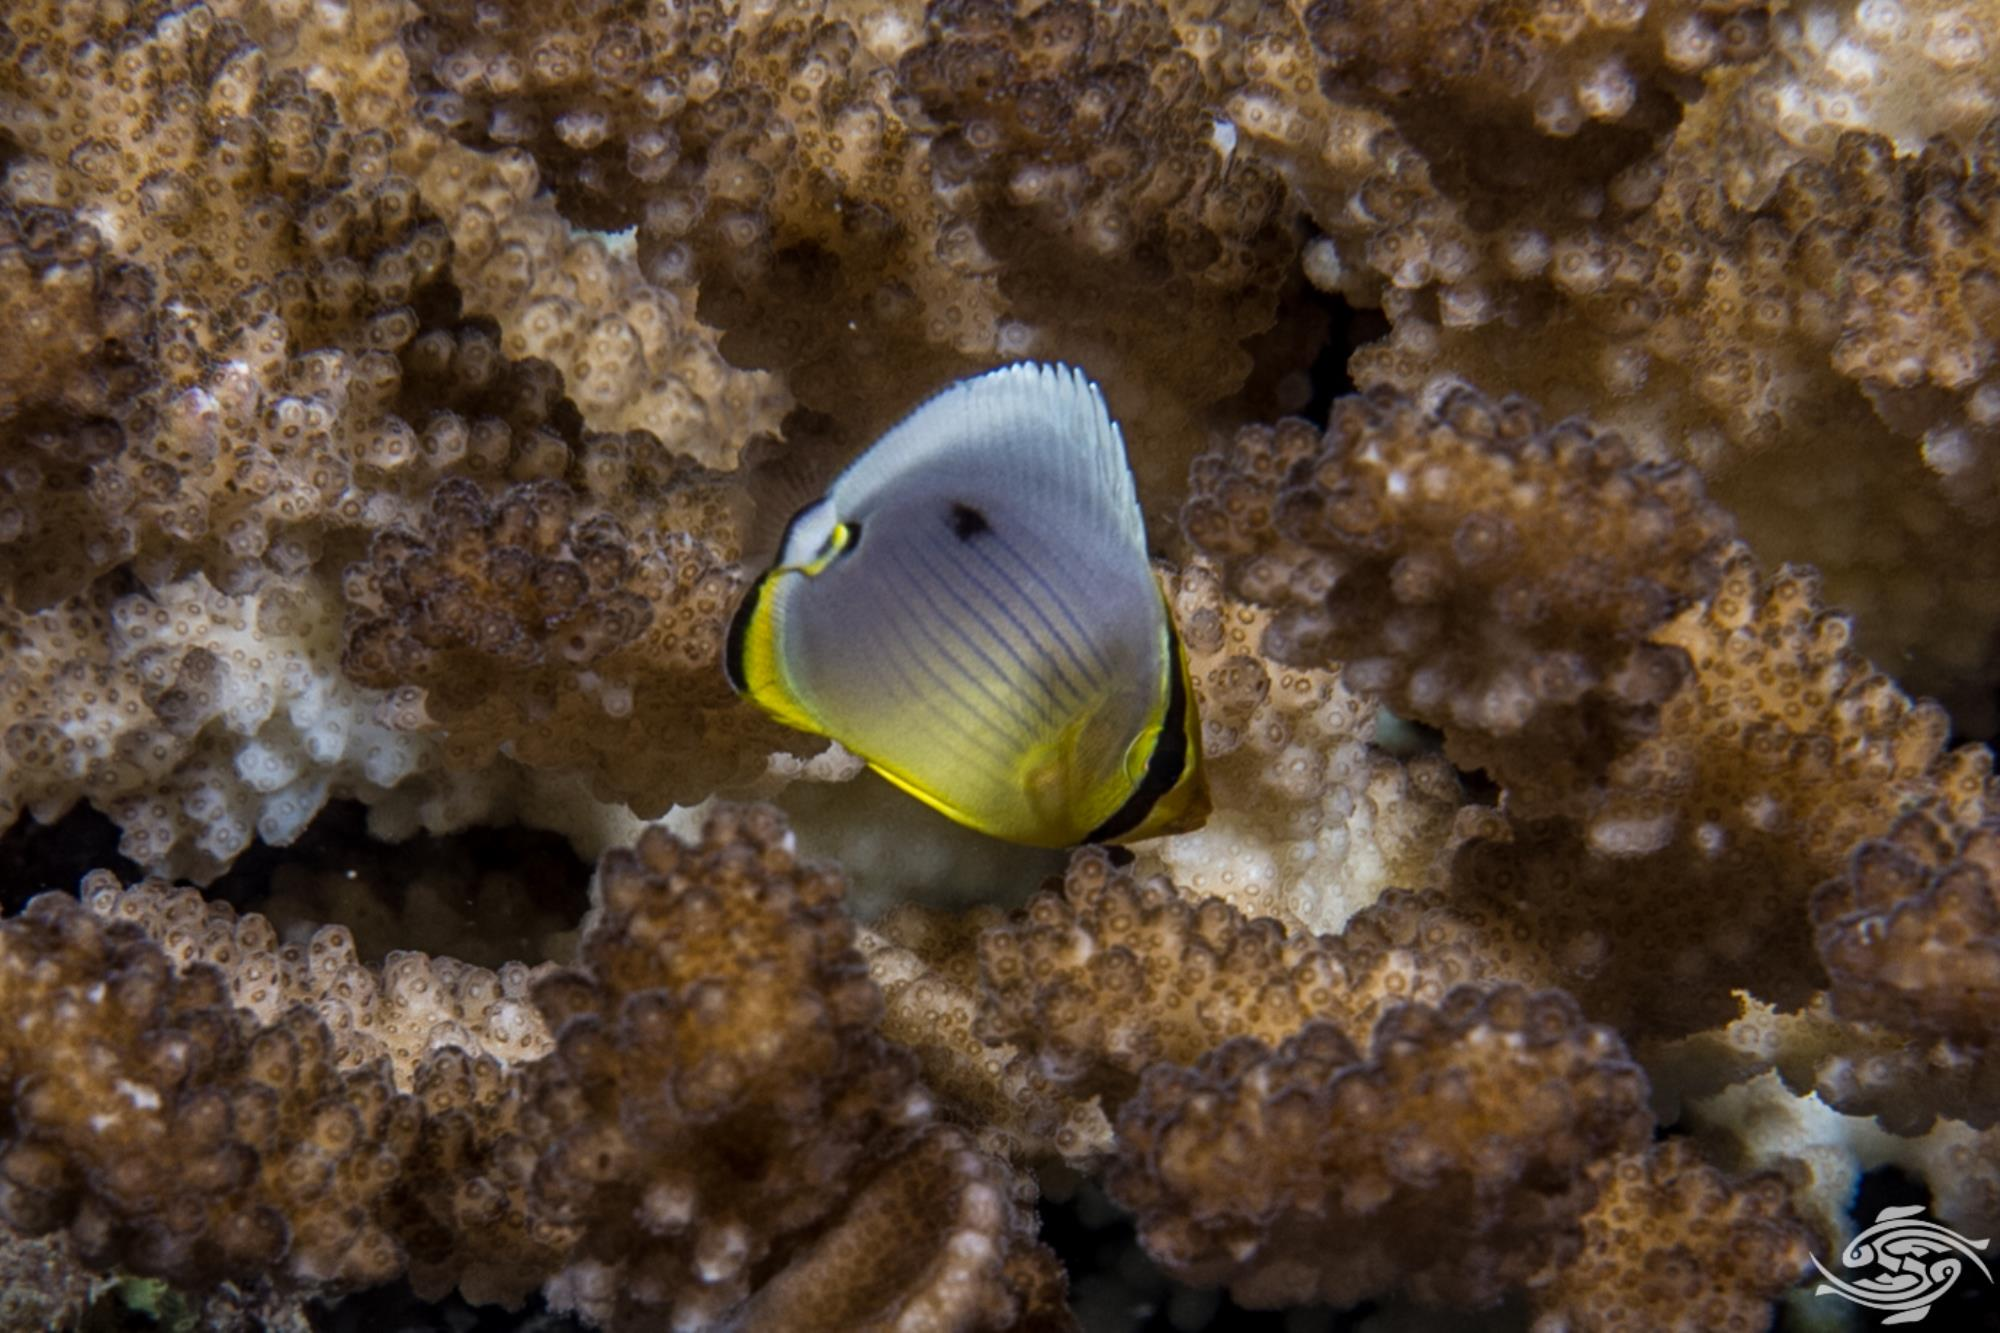 Juvenile Melon Butterflyfish (Chaetodon Trifaciatus)